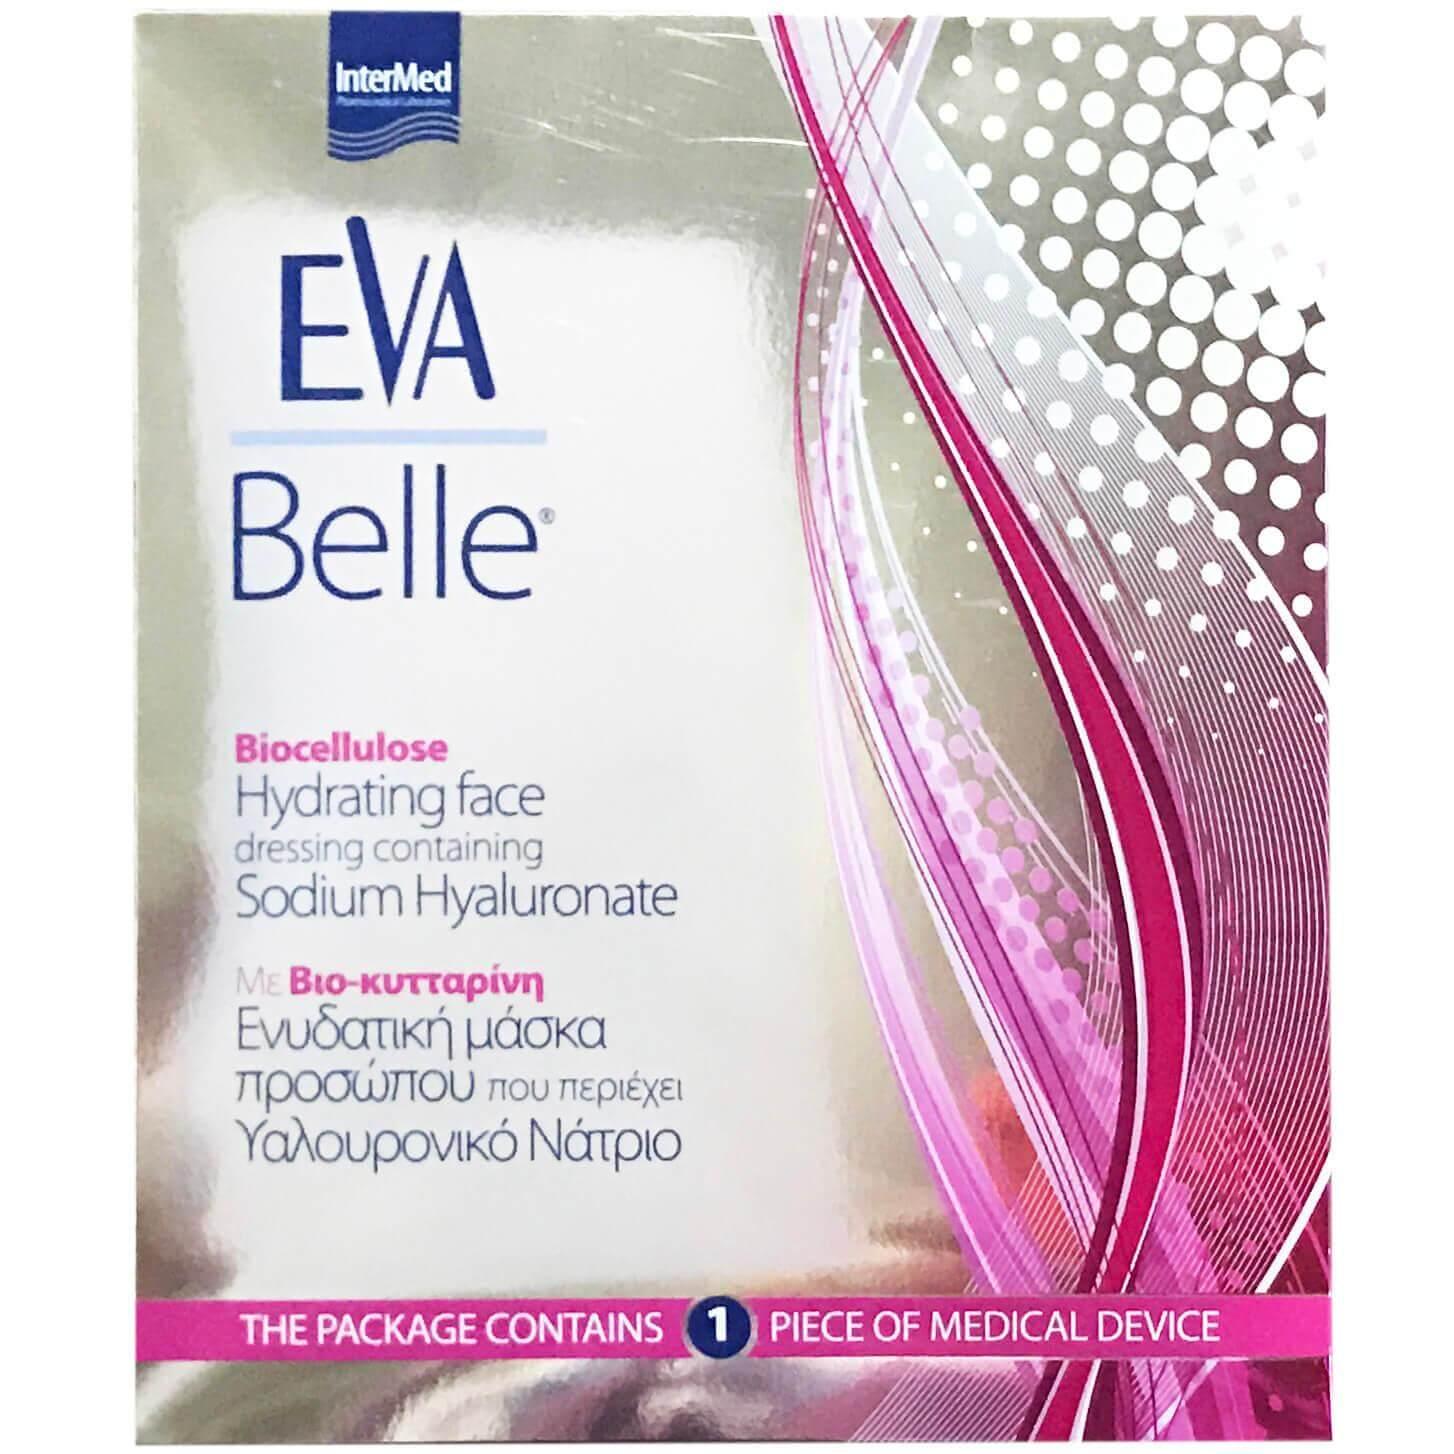 Eva Belle Hydrating Face Ενυδατική Μάσκα Προσώπου με Υαλουρονικό Νάτριο 1 Τεμάχιο